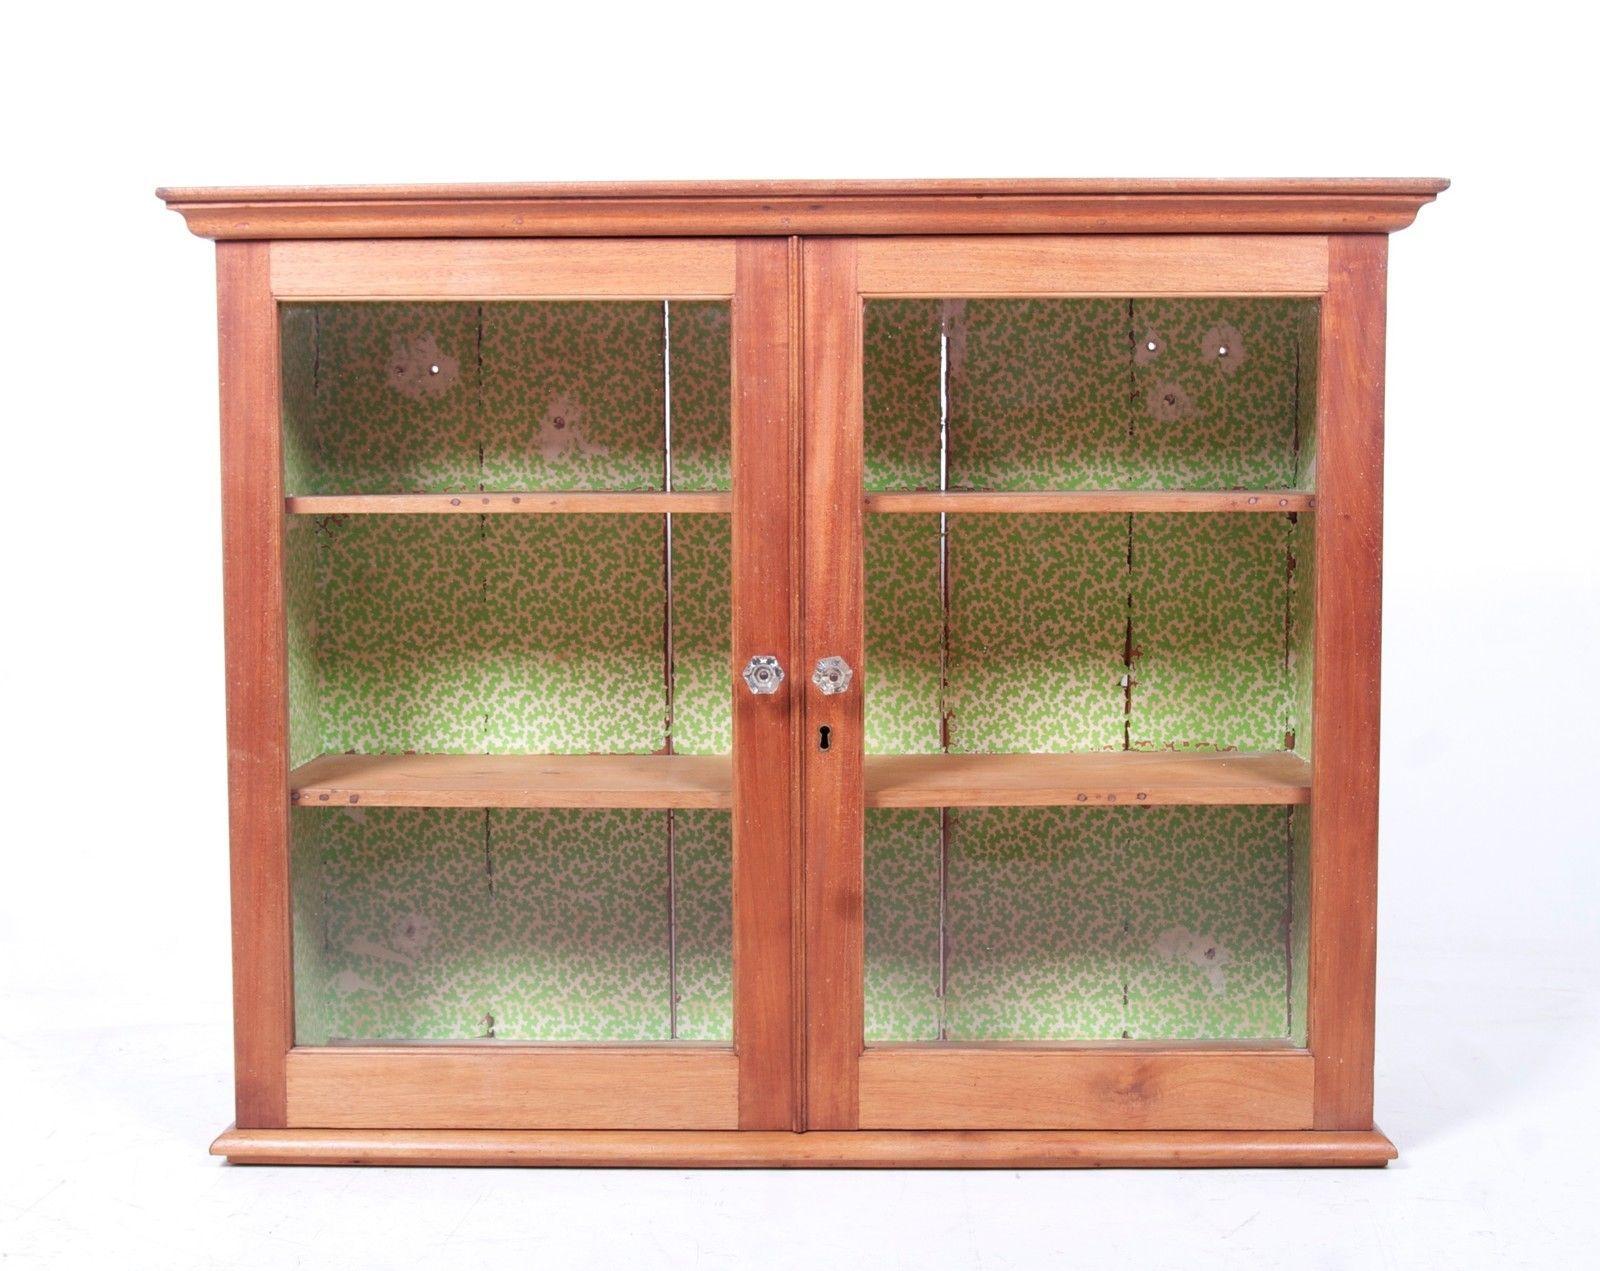 Antique Pine Display Cabinet Specimen Victorian Stripped